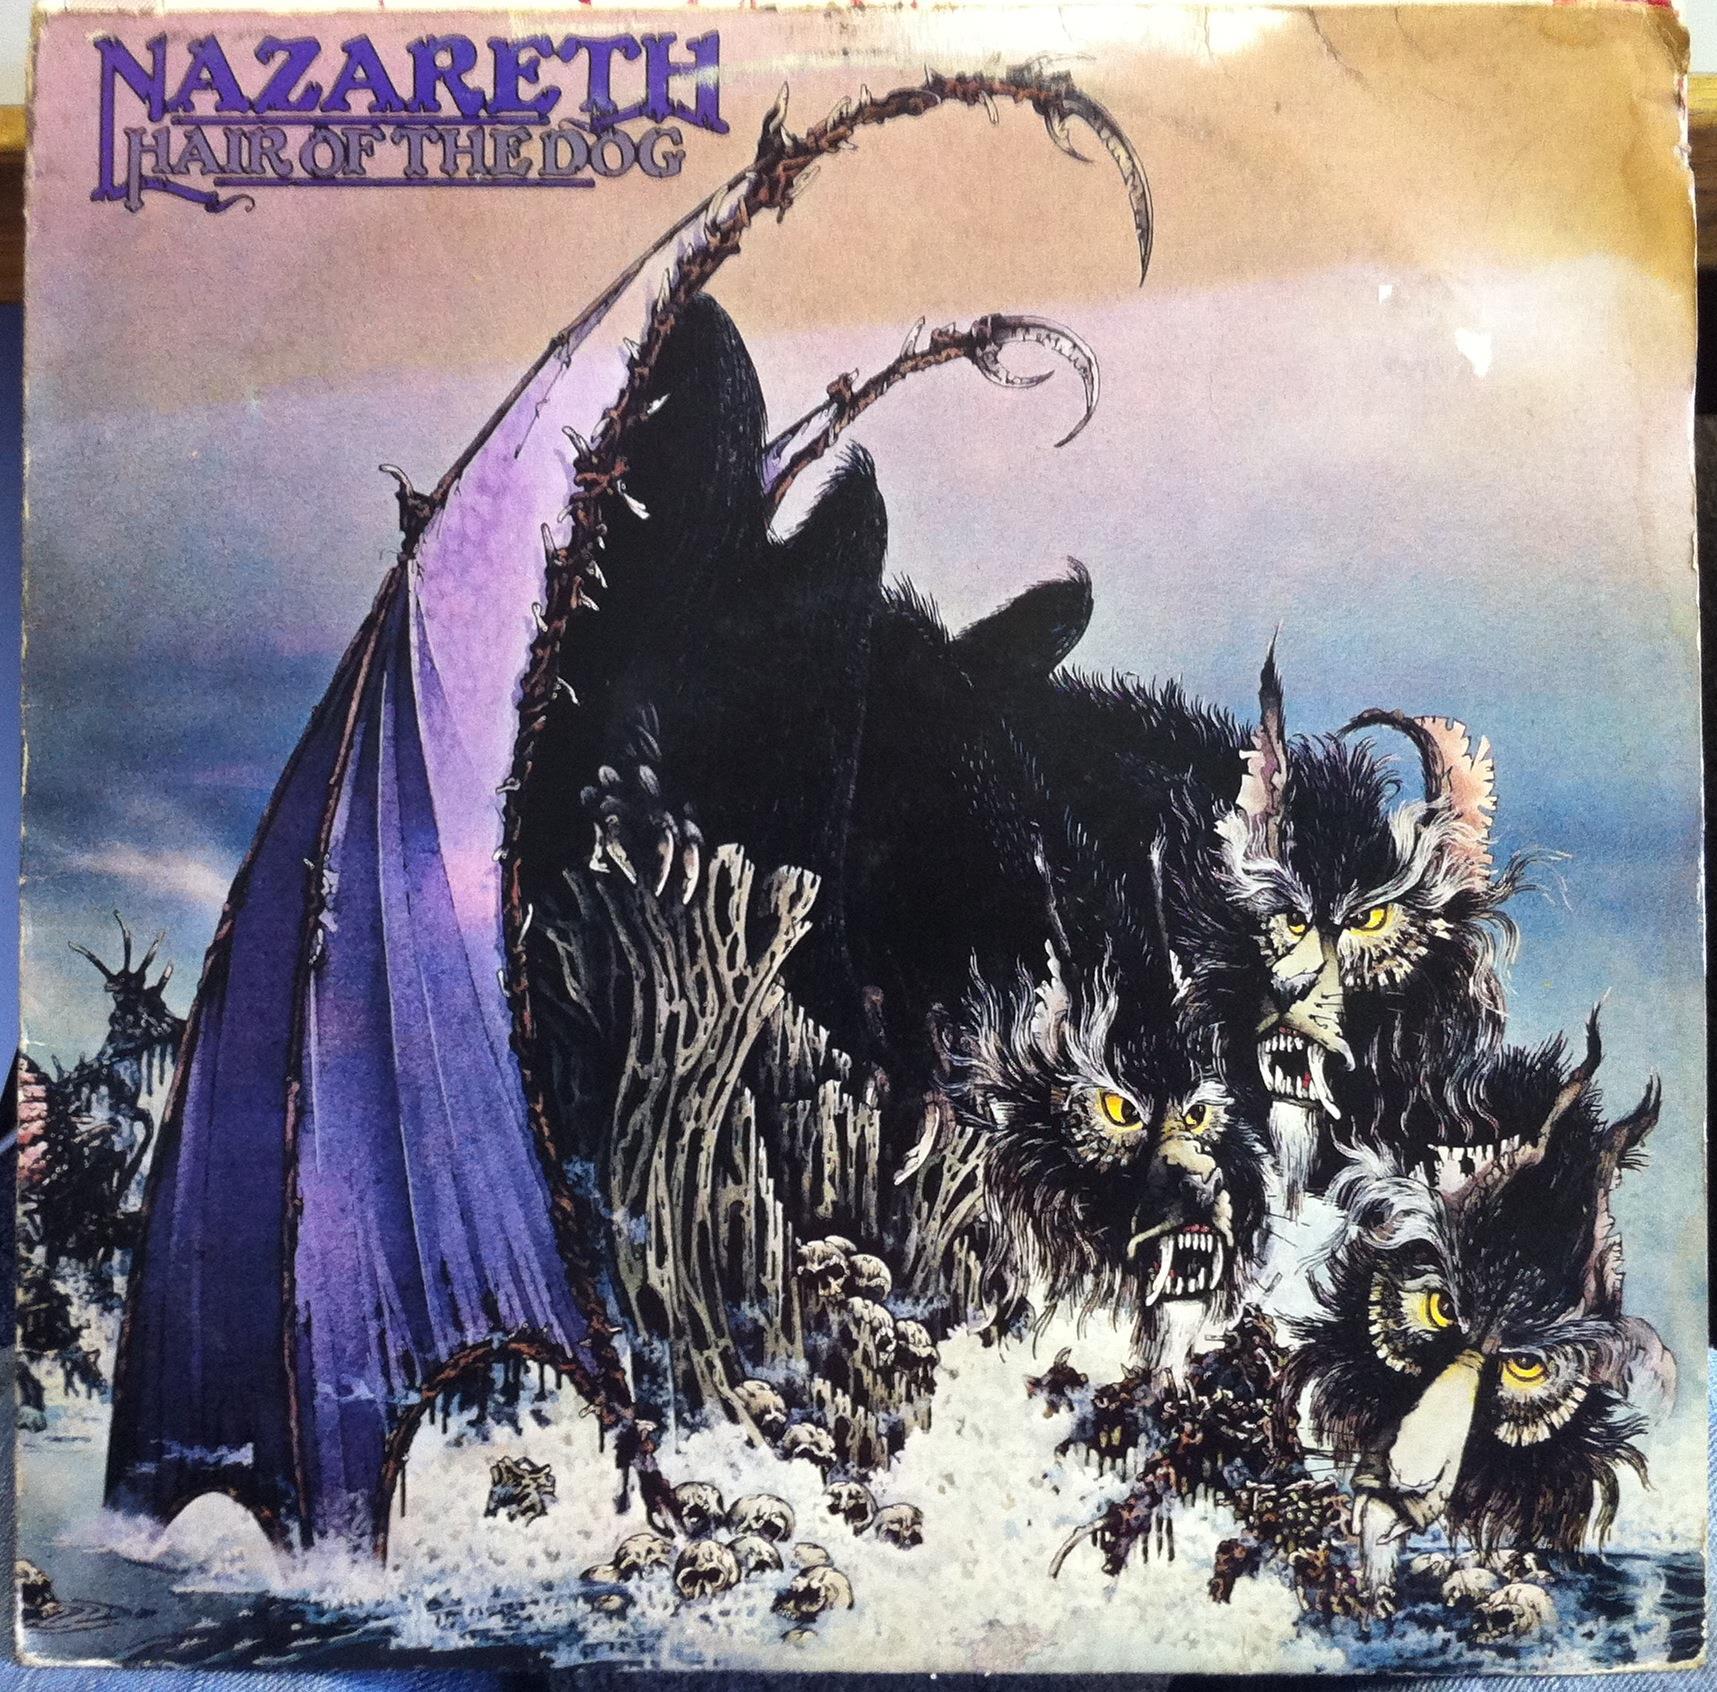 Nazareth Hair Of The Dog Lp Vg Nel 6024 Vinyl 1975 Uk